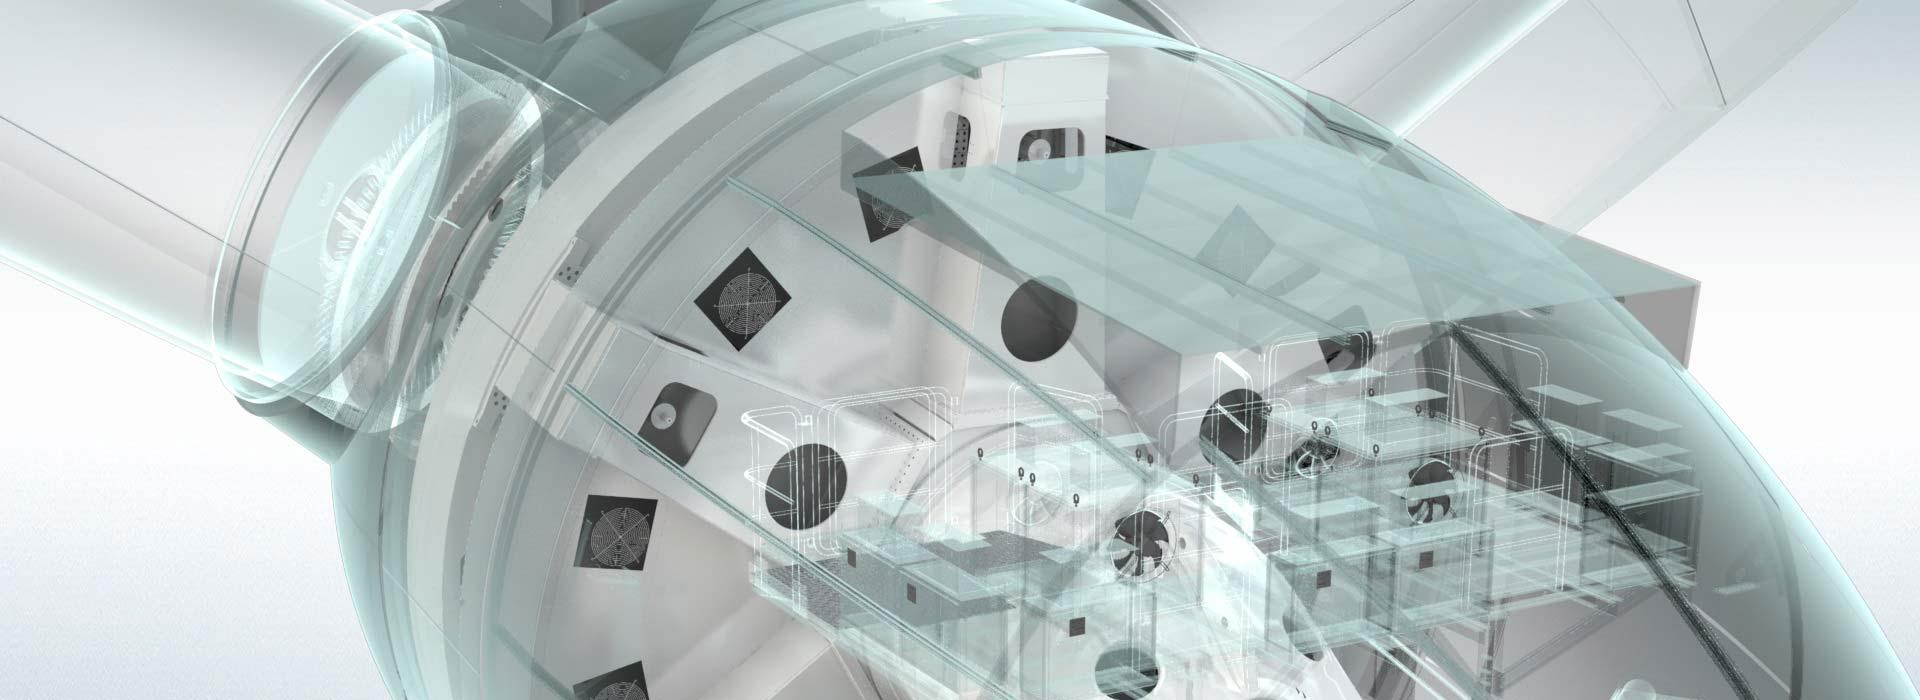 Connecting Composites - Generator - © ENERCON GmbH